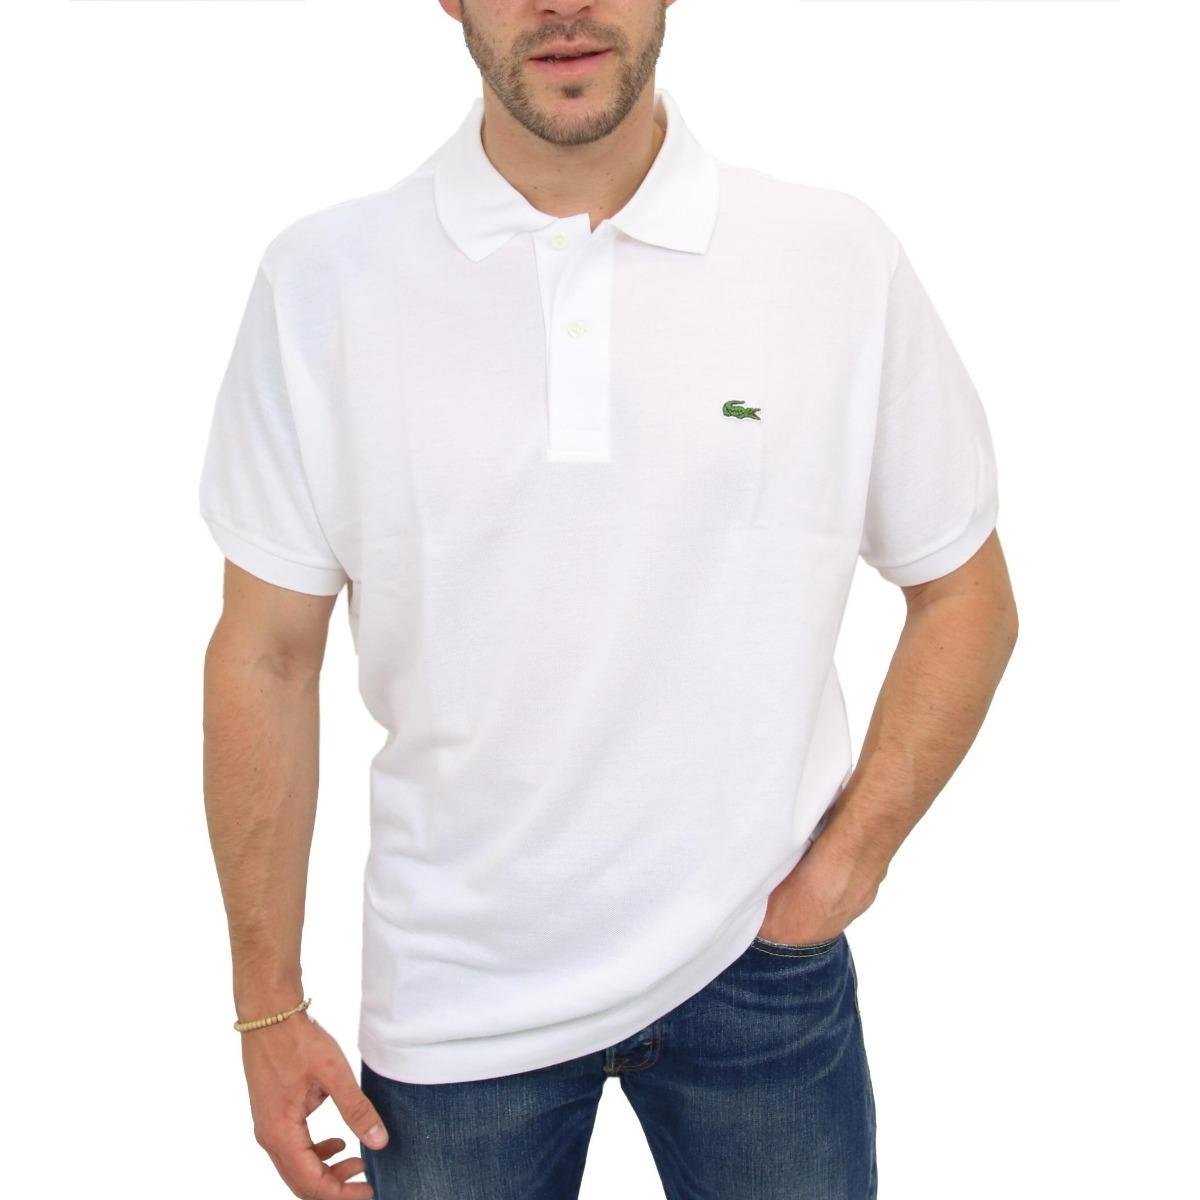 camisetas lacoste gola polos importada original ralph lauren. Carregando  zoom. 0cf8af07a159f